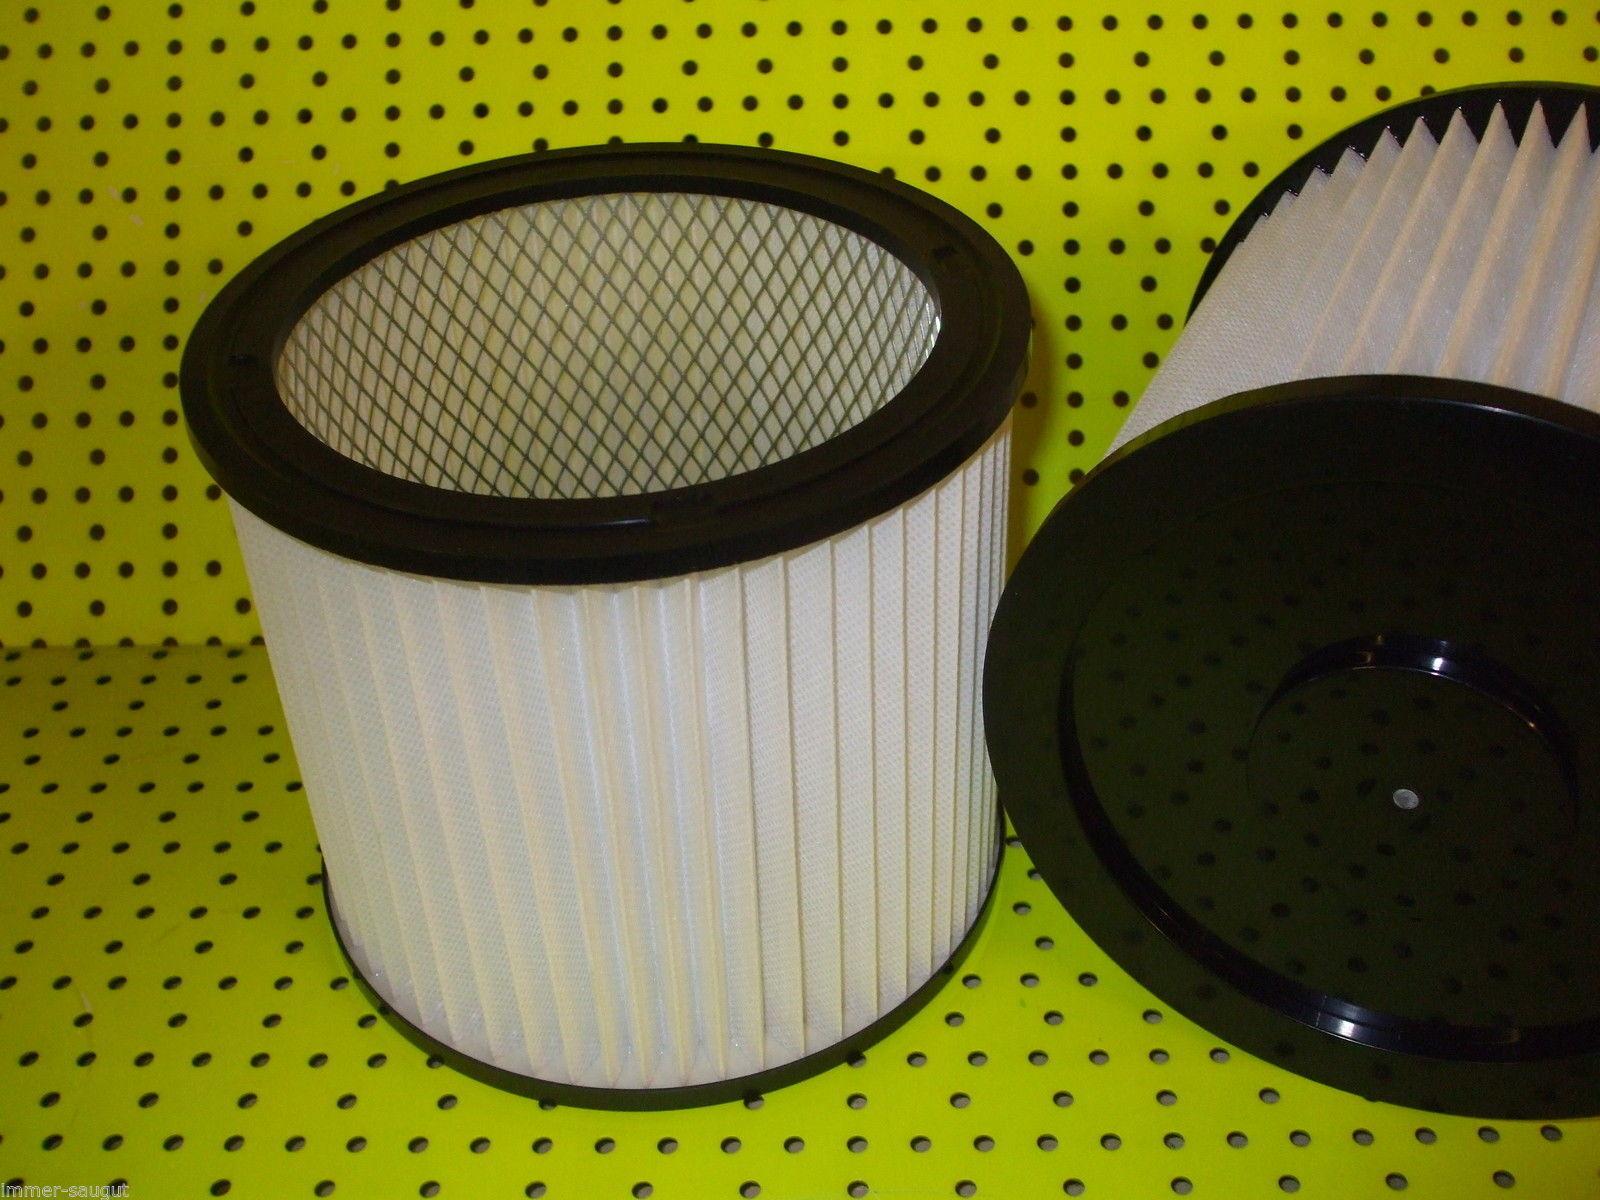 Vlies Beutel +/- Filter geeignet für Parkside PNTS 30,1300, 1400, 1500 usw.